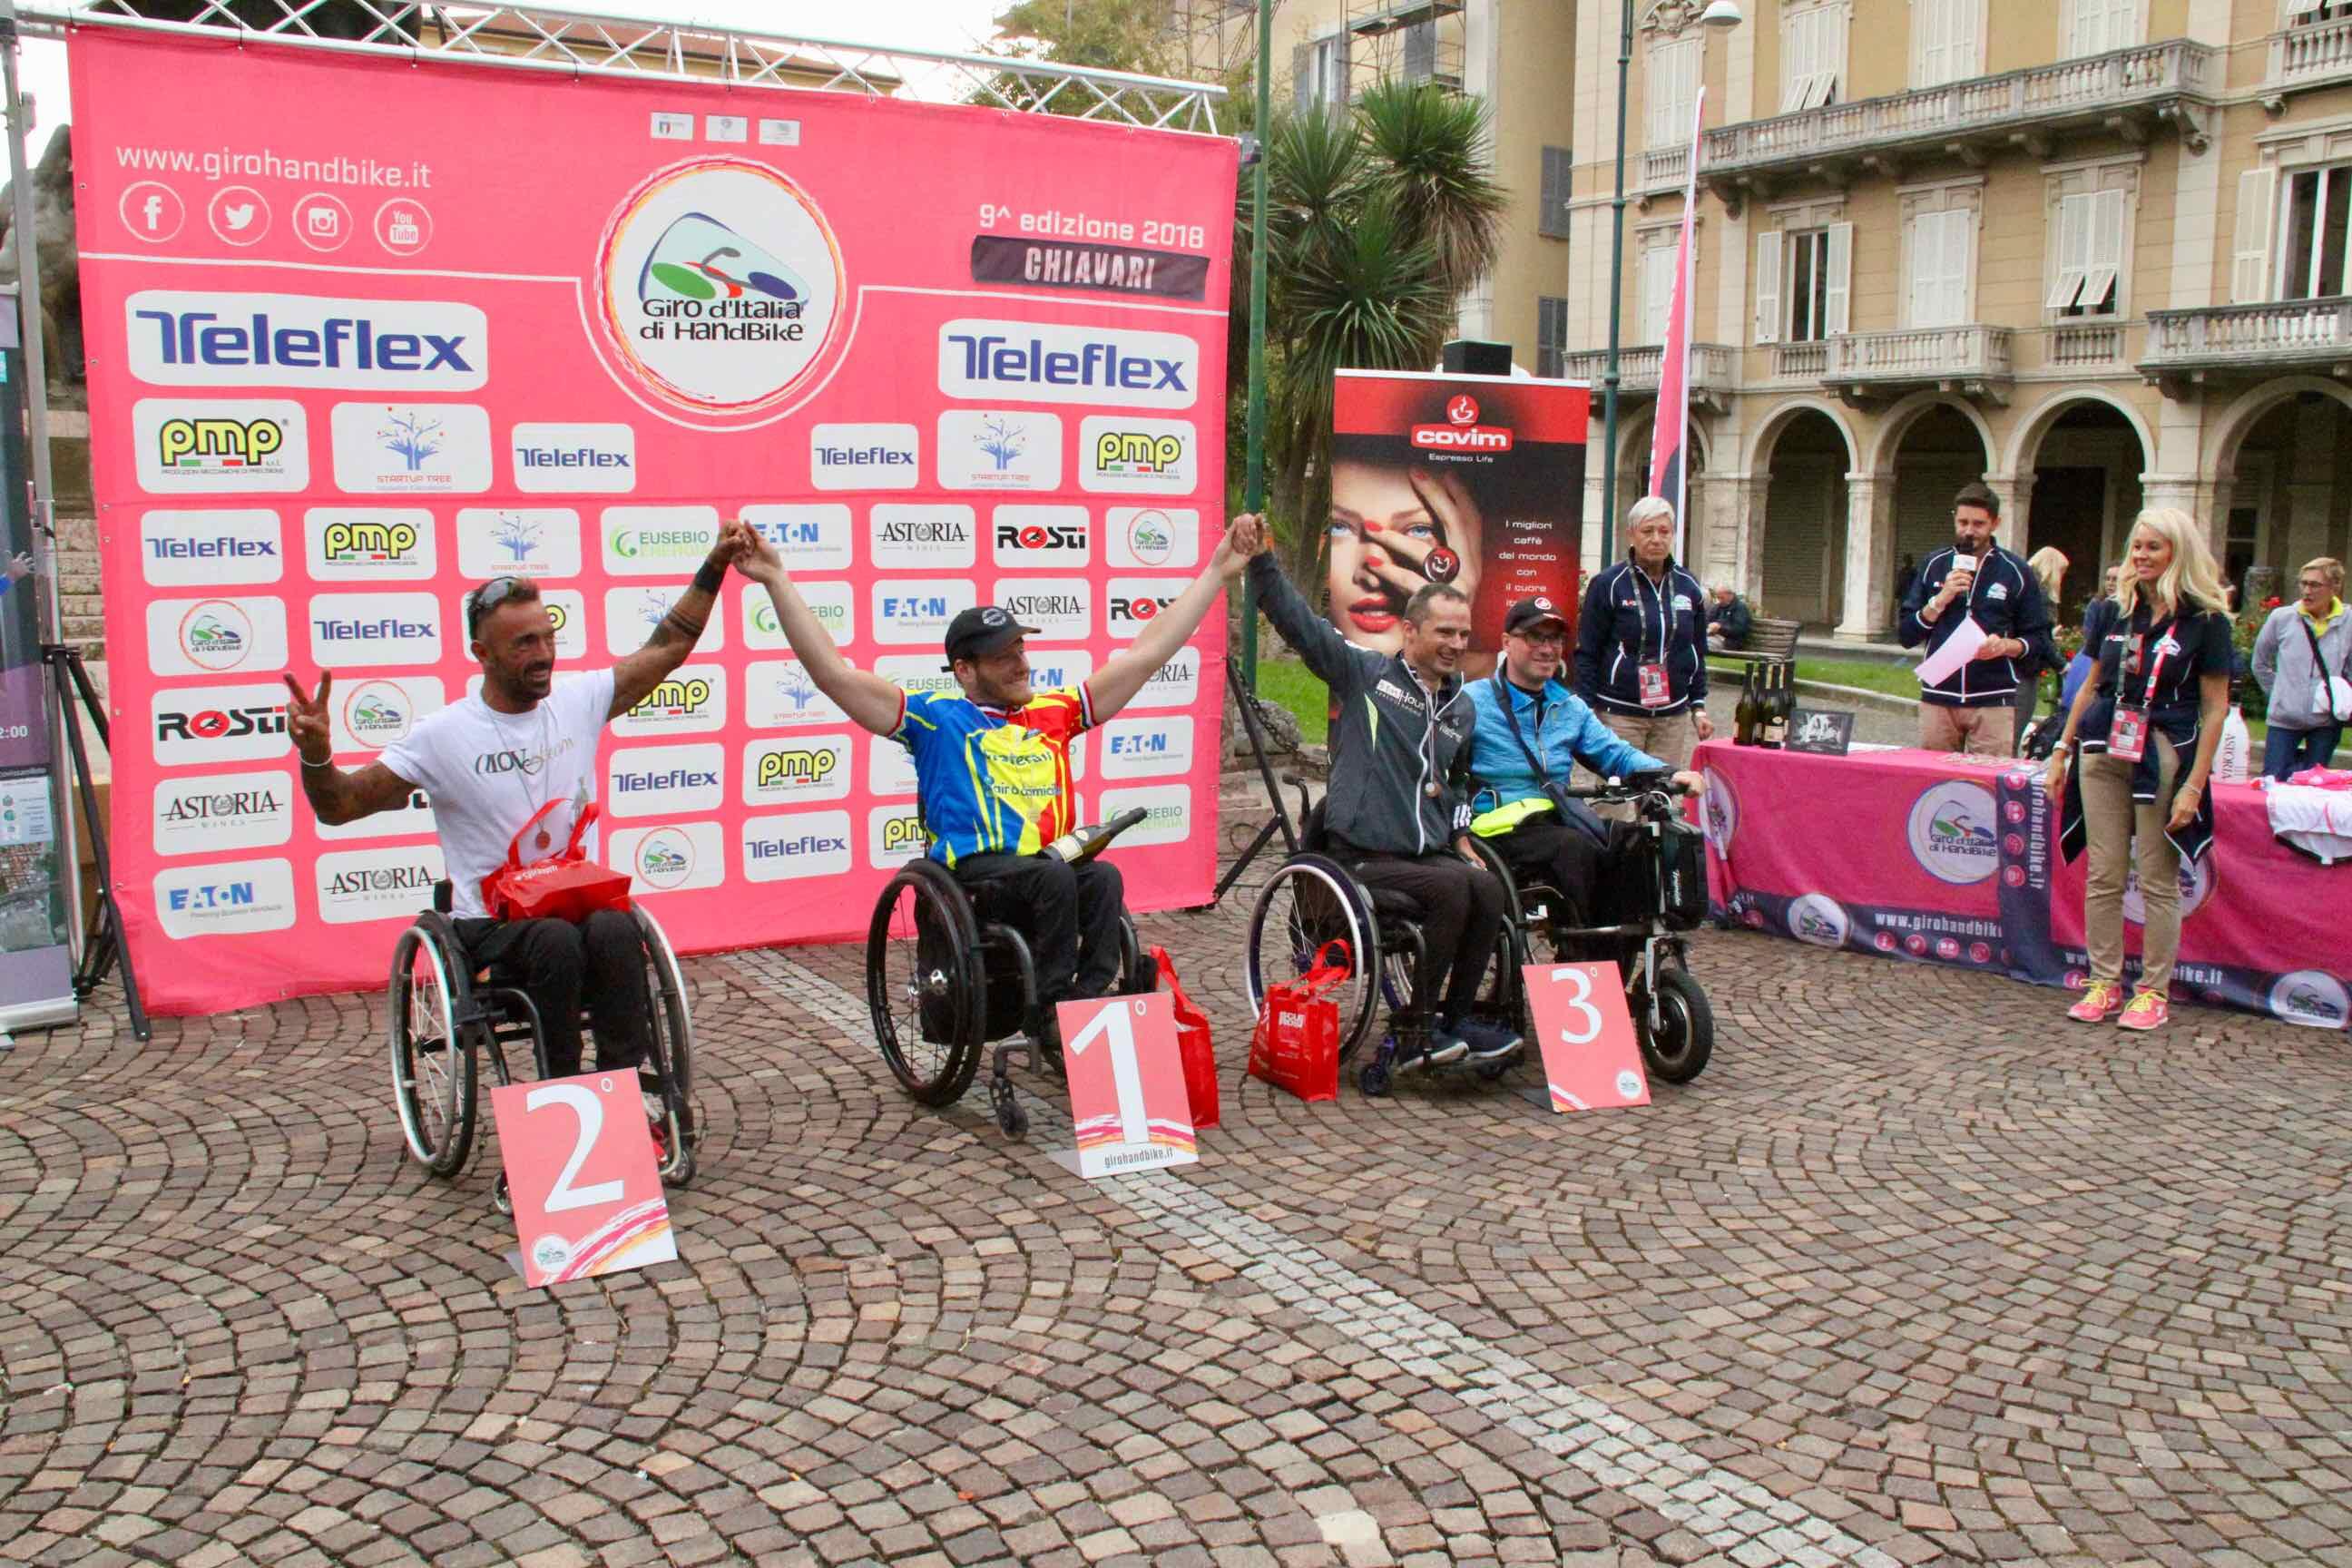 1° Memorial don Nando Negri a Chiavari per il Giro d'Italia Handbike 2018 - 22